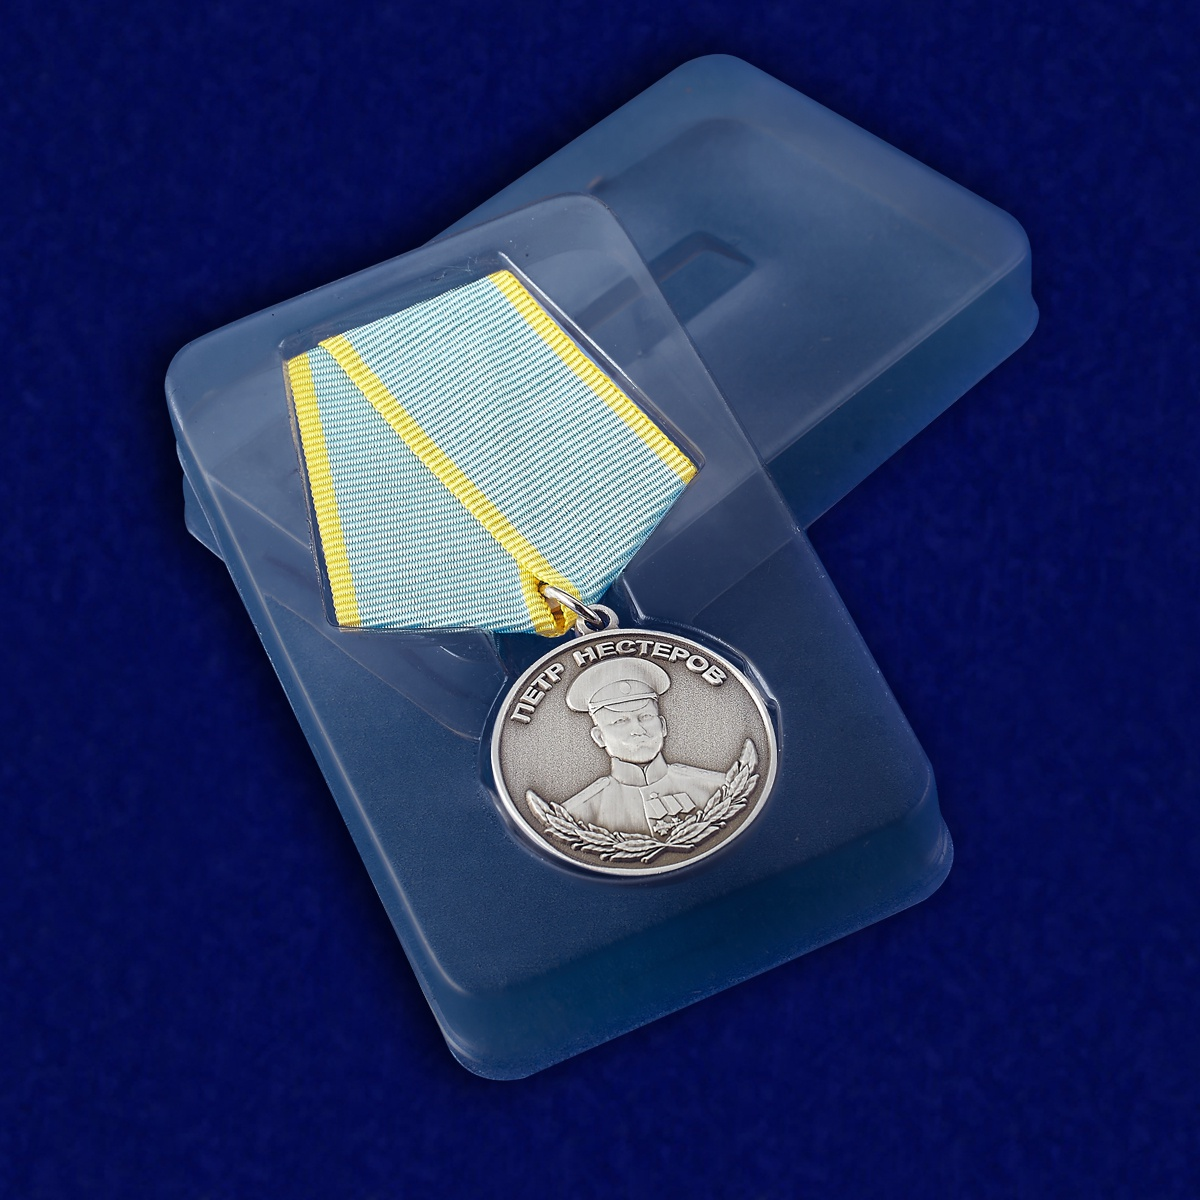 Футляр к медали Нестерова